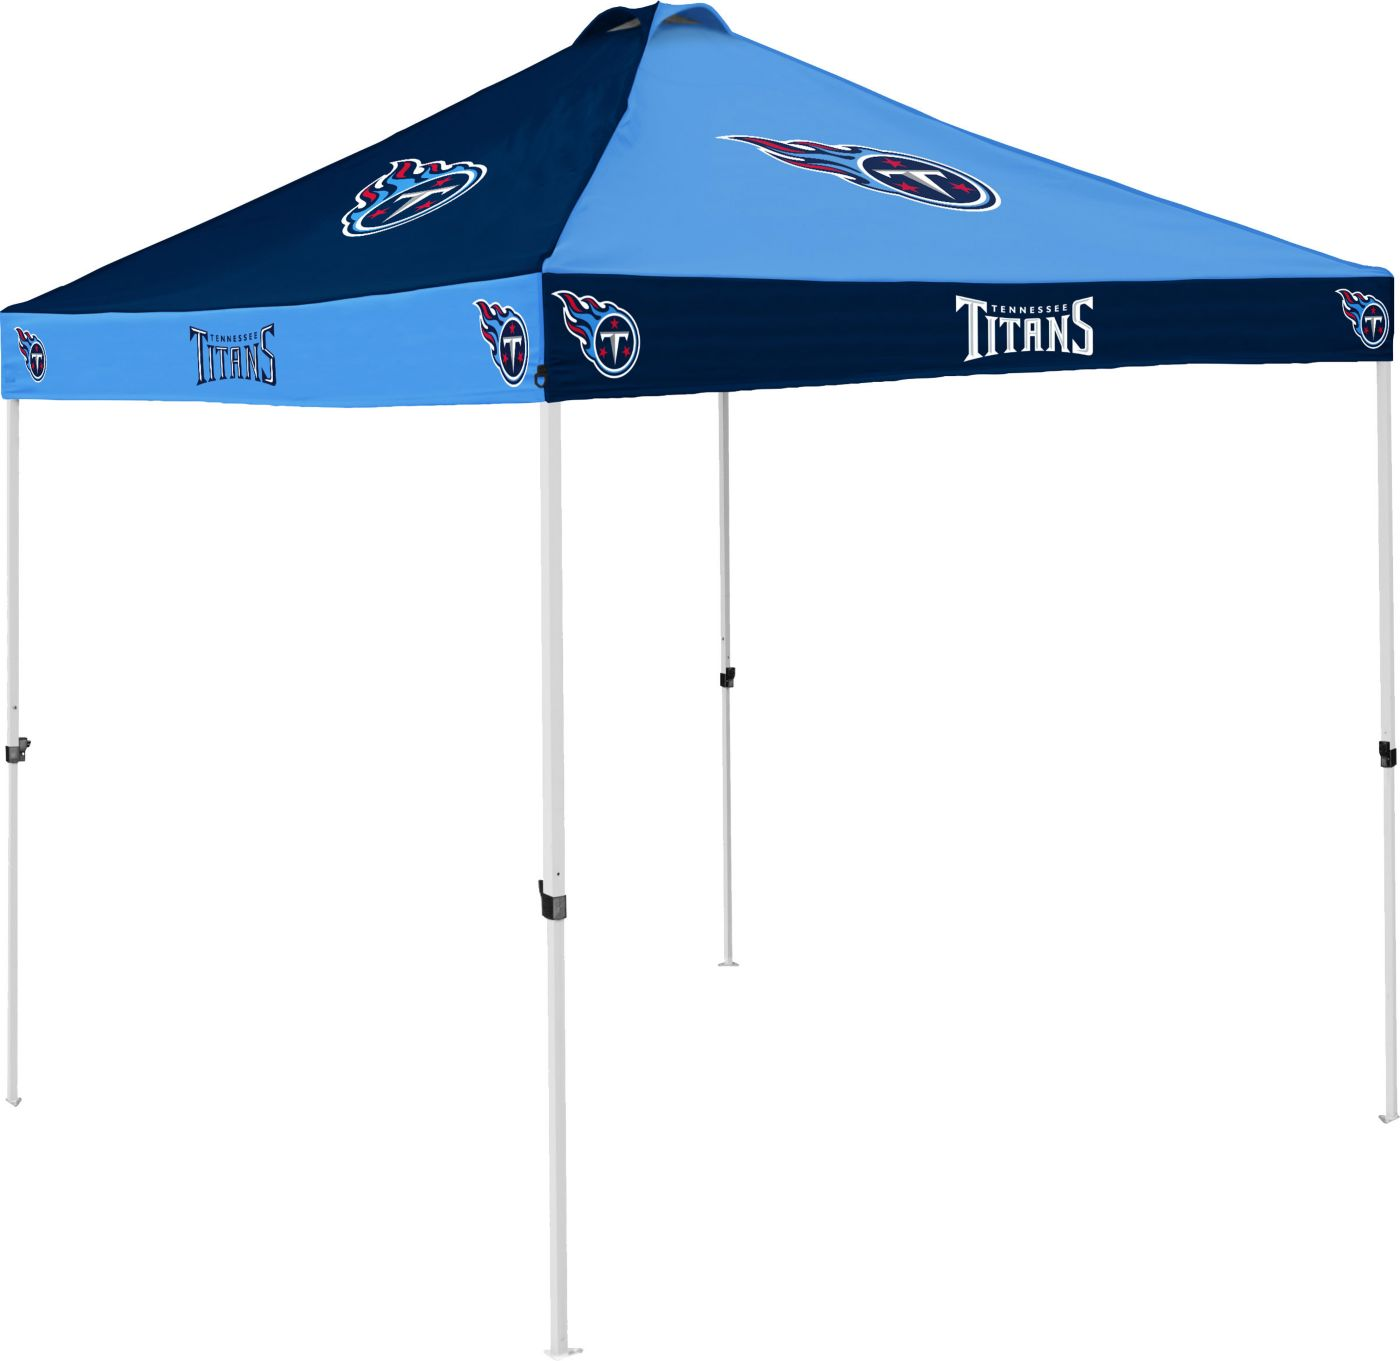 Tennessee Titans Checkerboard Tent